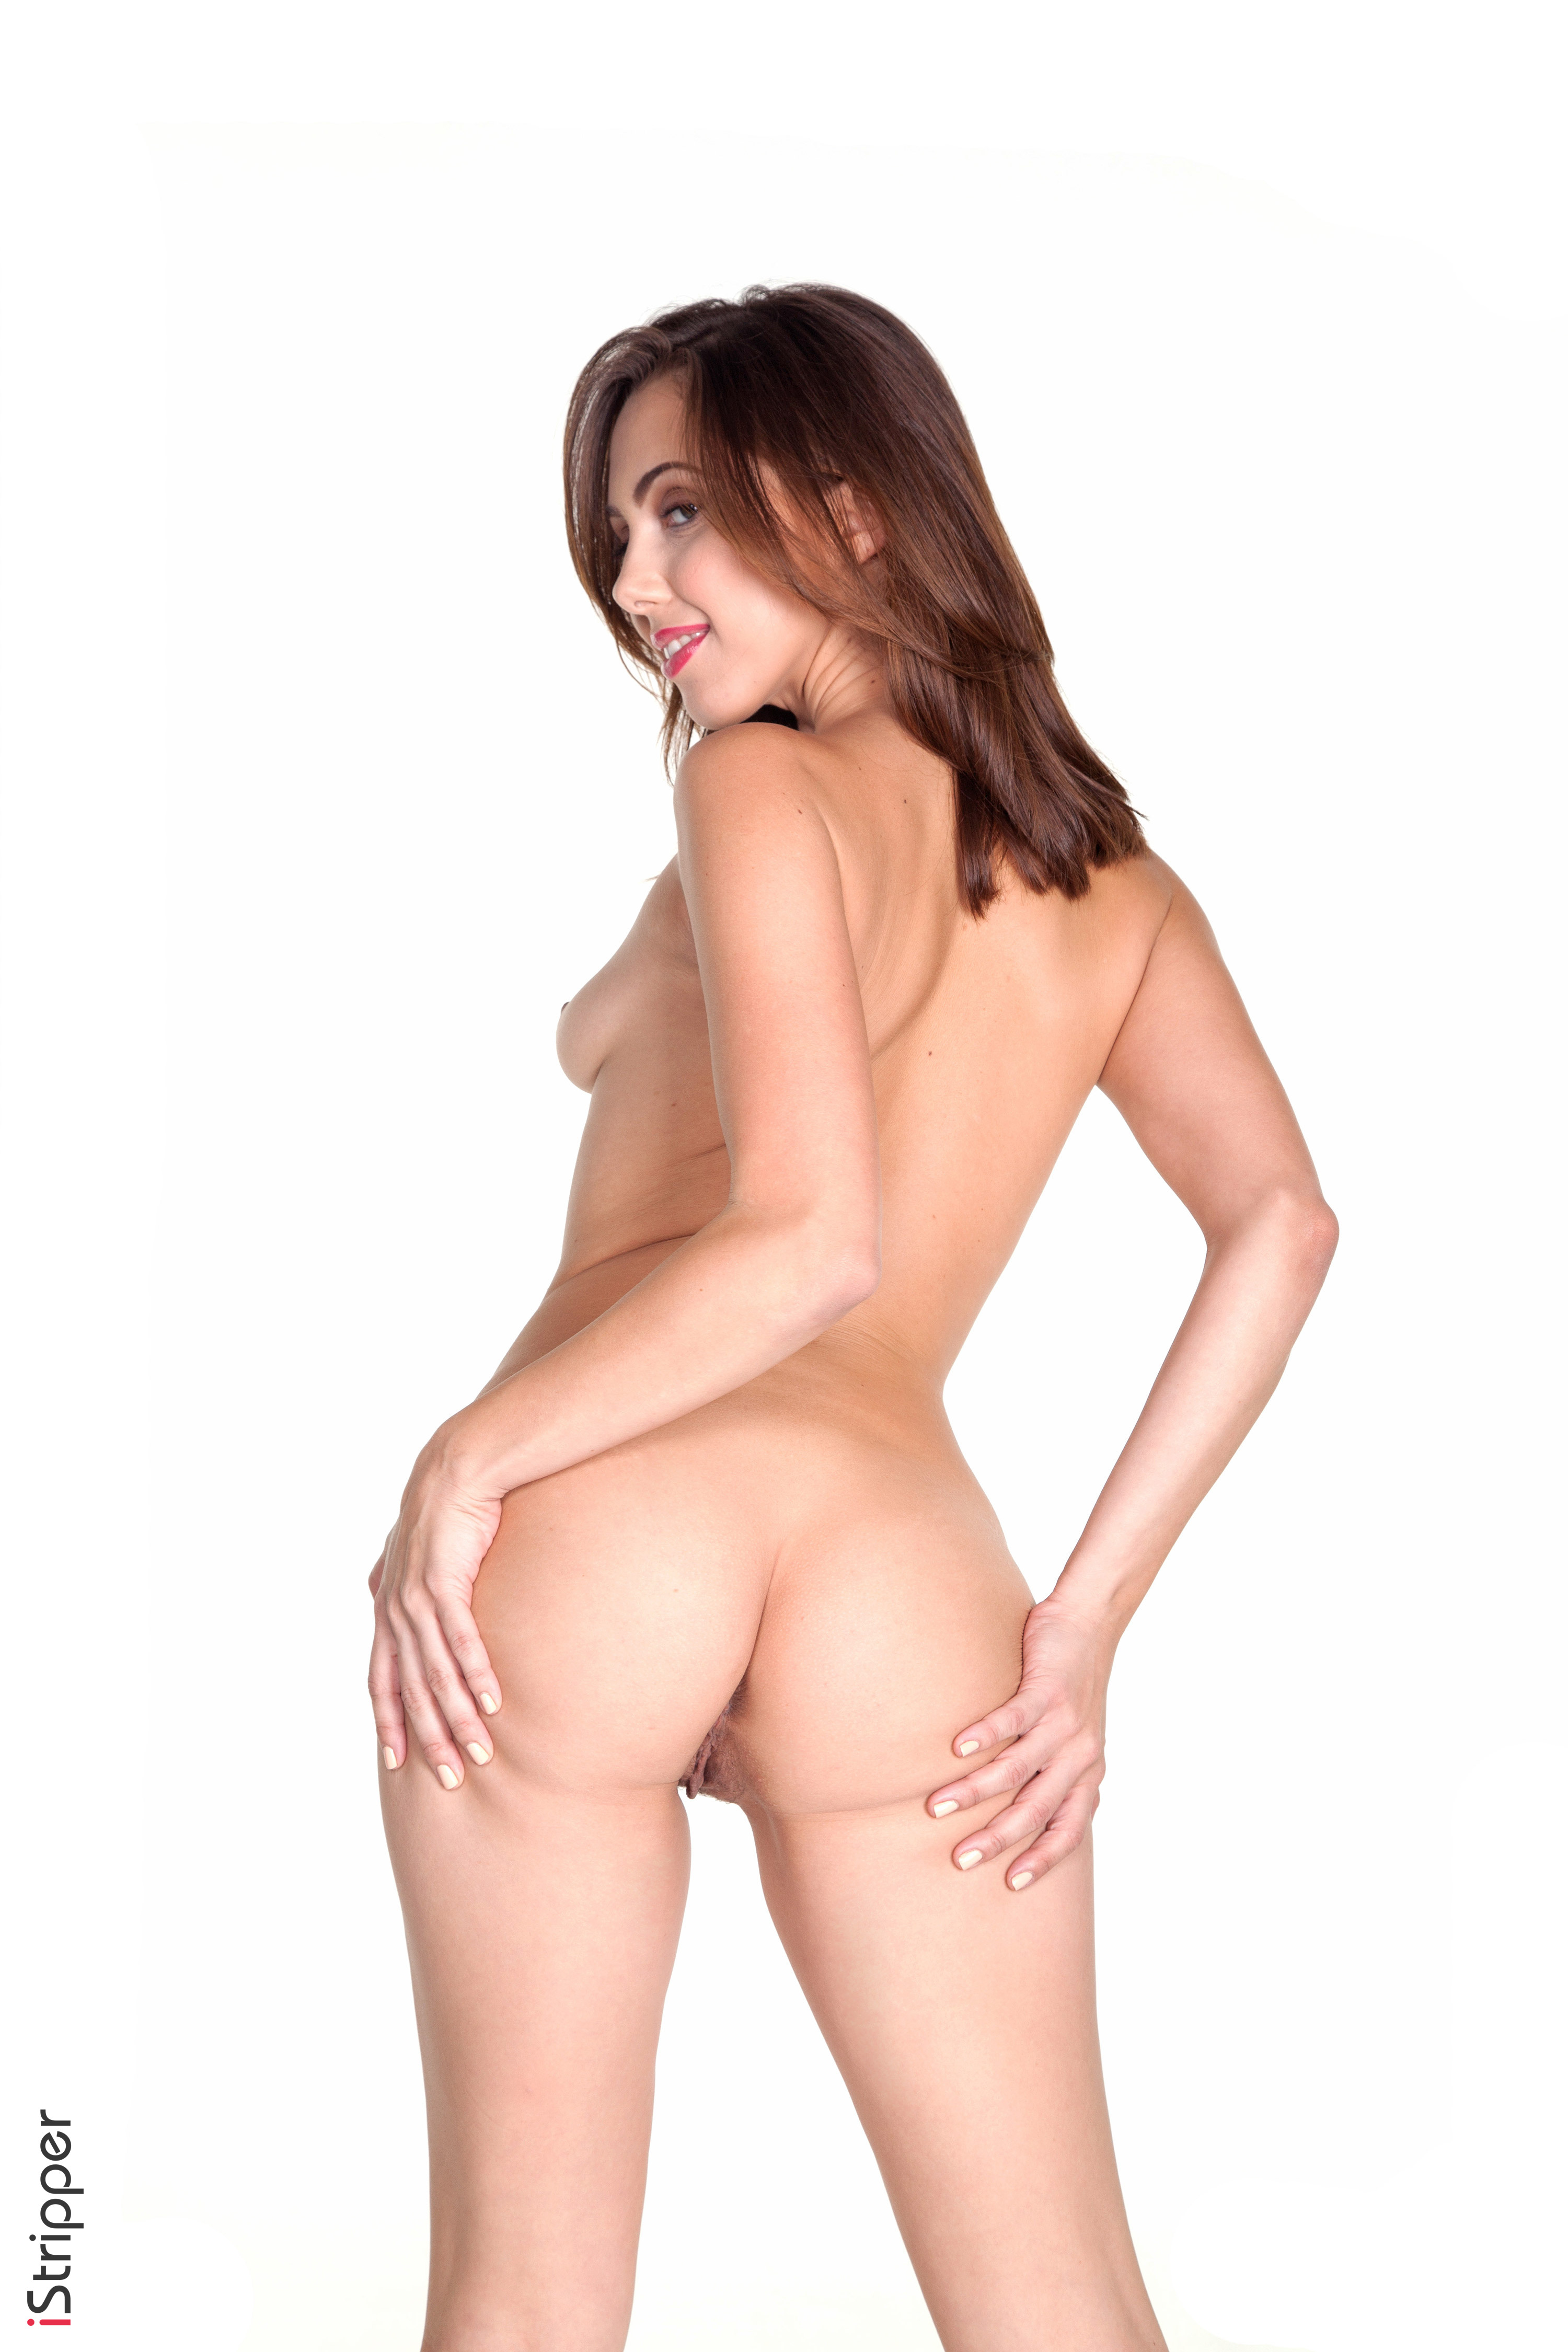 girls stripping on twitch